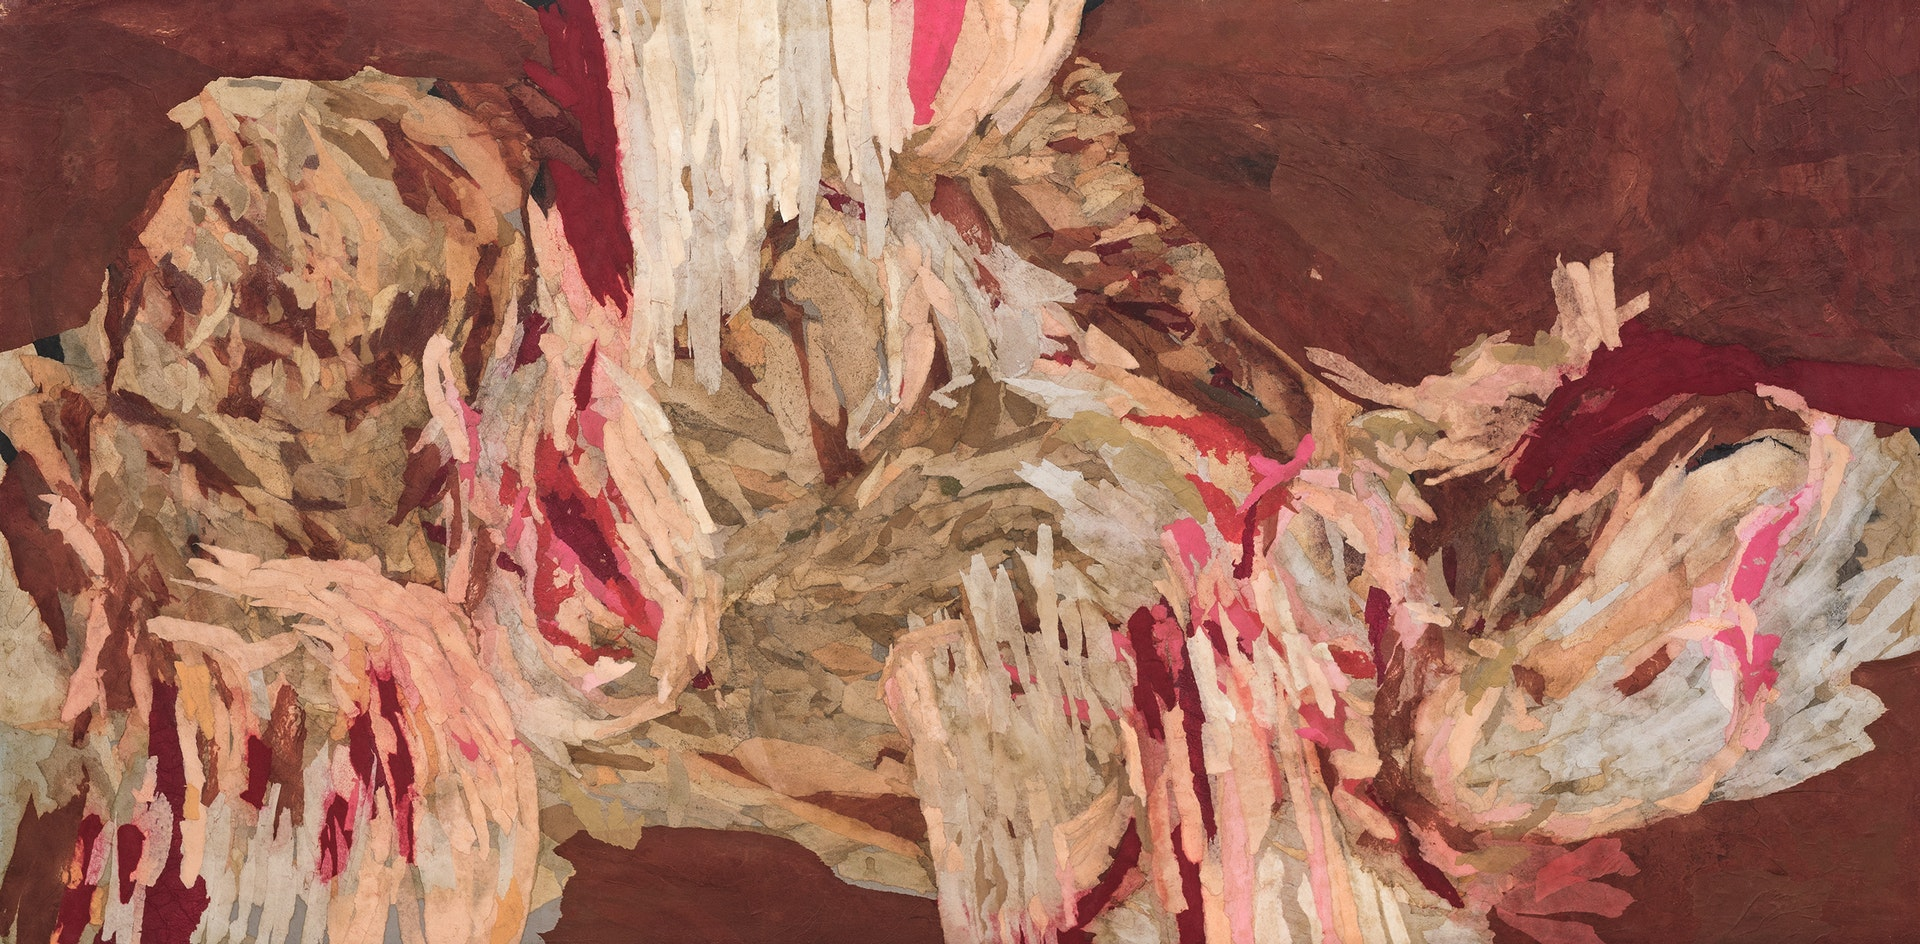 'Raw (En carne viva)', Ramón Redondo, Collage on board, 60 x 120 cm